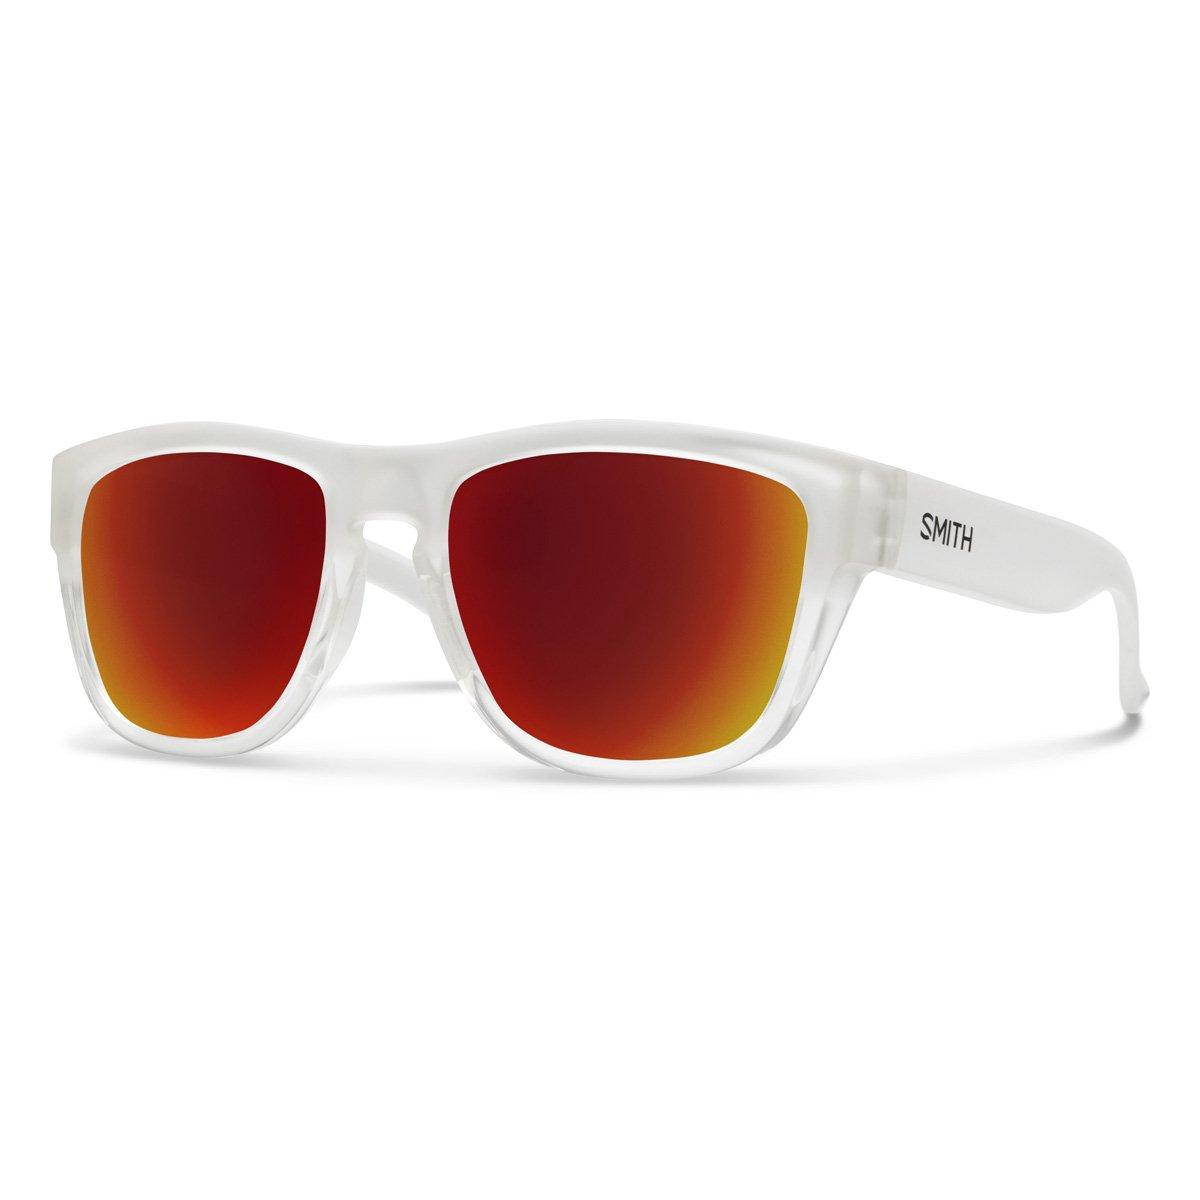 c3dc341fa3bc3 Amazon.com  Smith Optics Clark Sunglasses.Crystal Split  Clothing